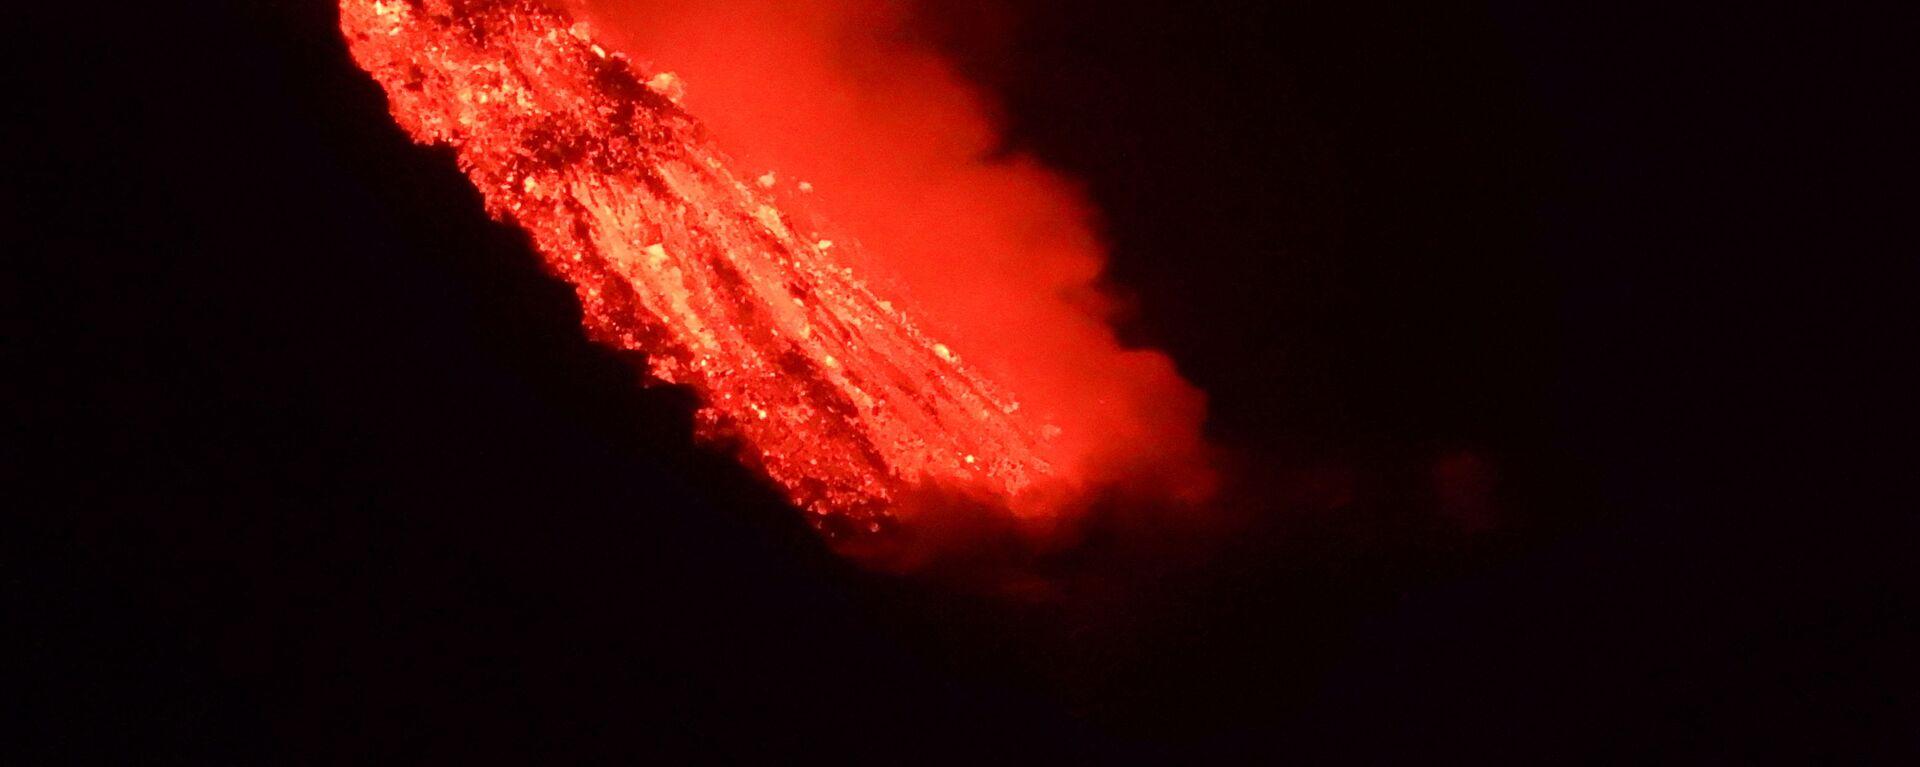 Лава течет в море после извержения вулкана на канарском острове Ла-Пальма - Sputnik Србија, 1920, 04.10.2021